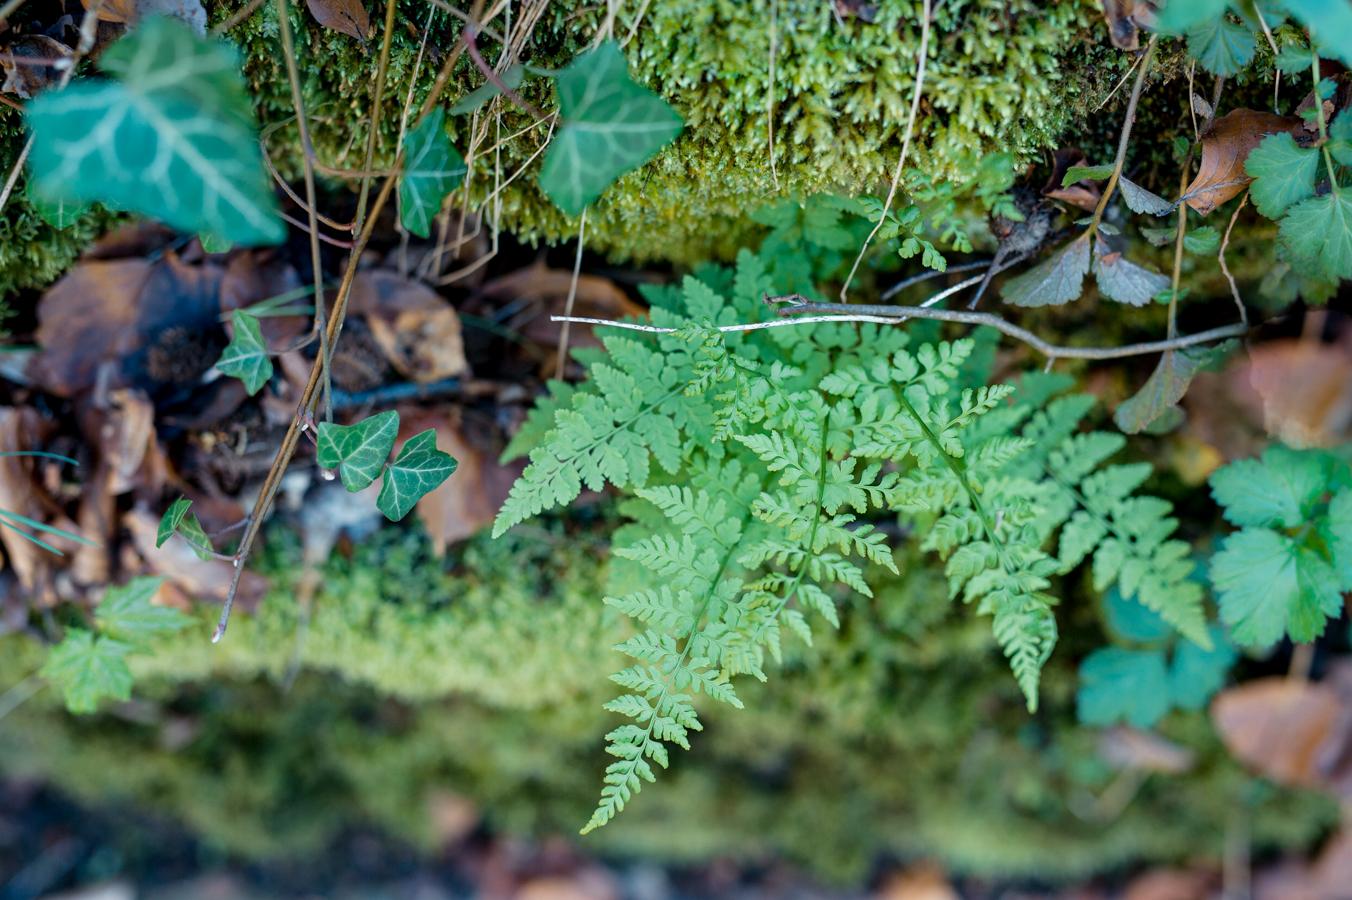 Végétation luxembourg fougère grund